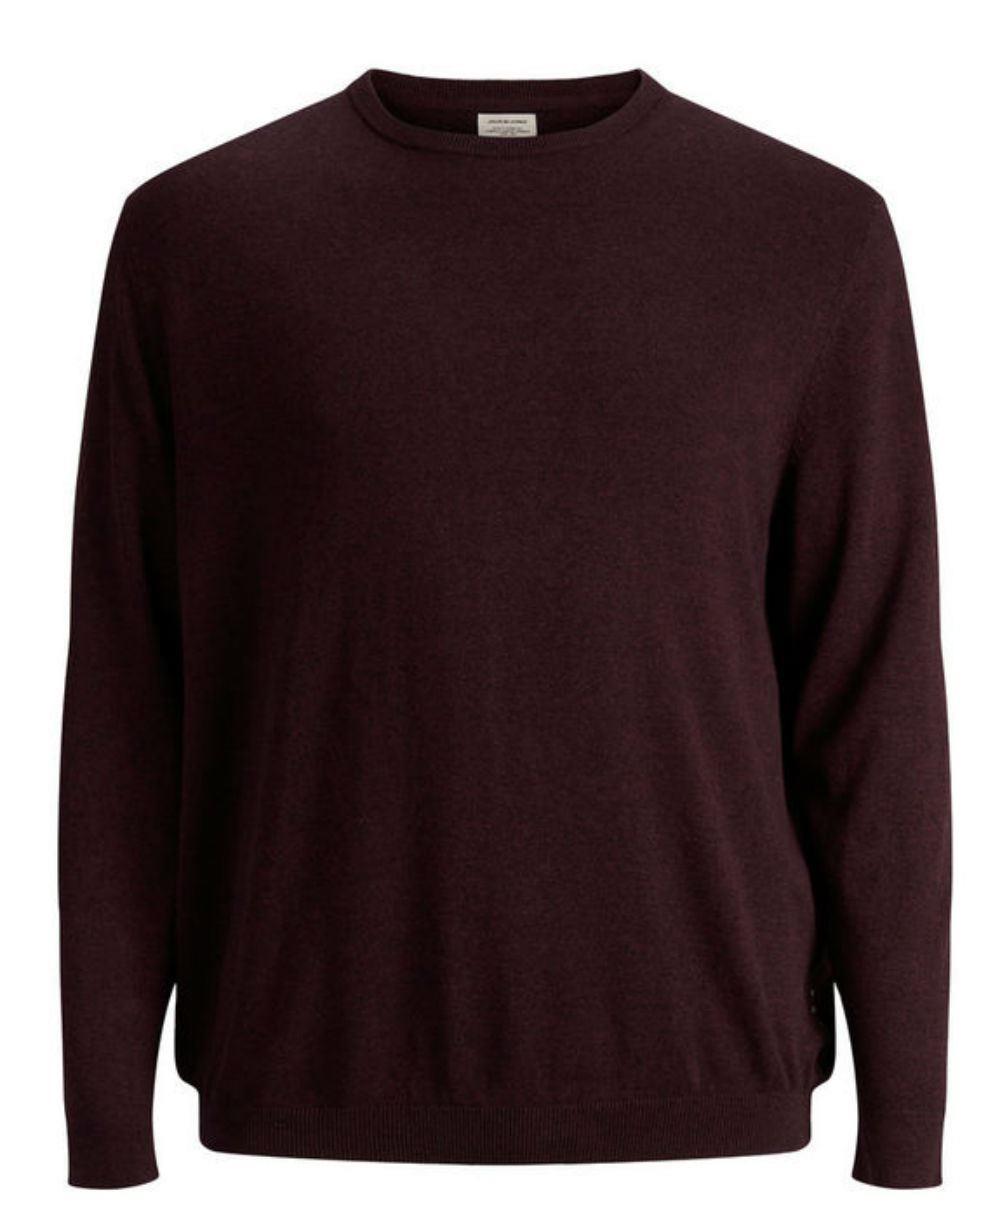 JACK   amp; JONES Plus Size Basic Pullover - Port Red 3XL